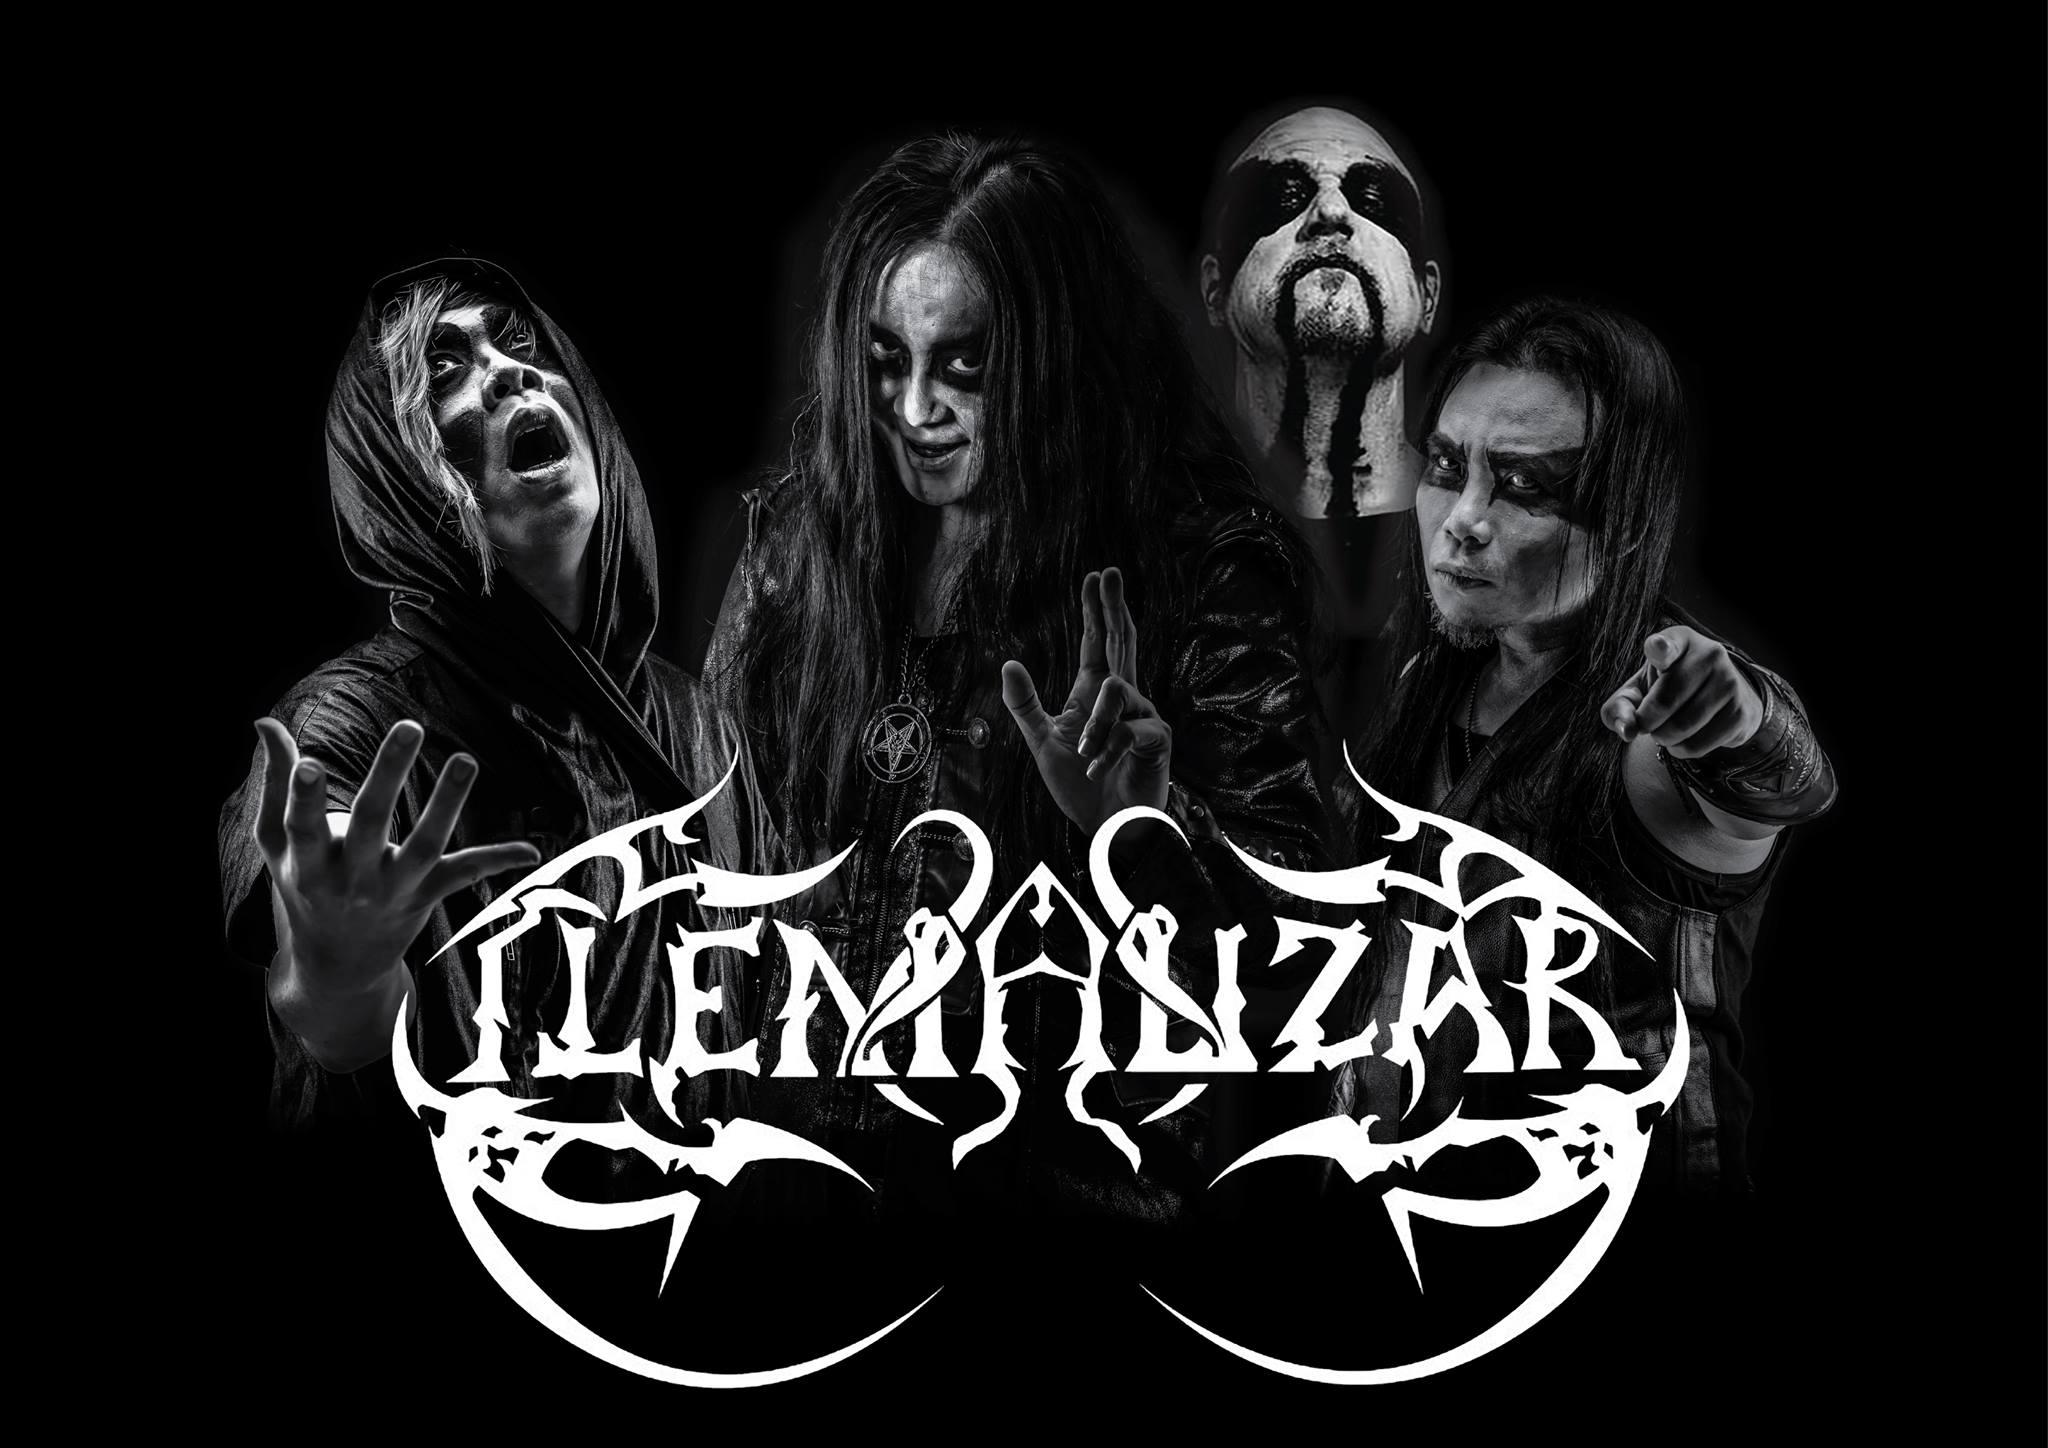 Singapore Black Metal Band Ilemauzar Gear Up To Release Debut Album